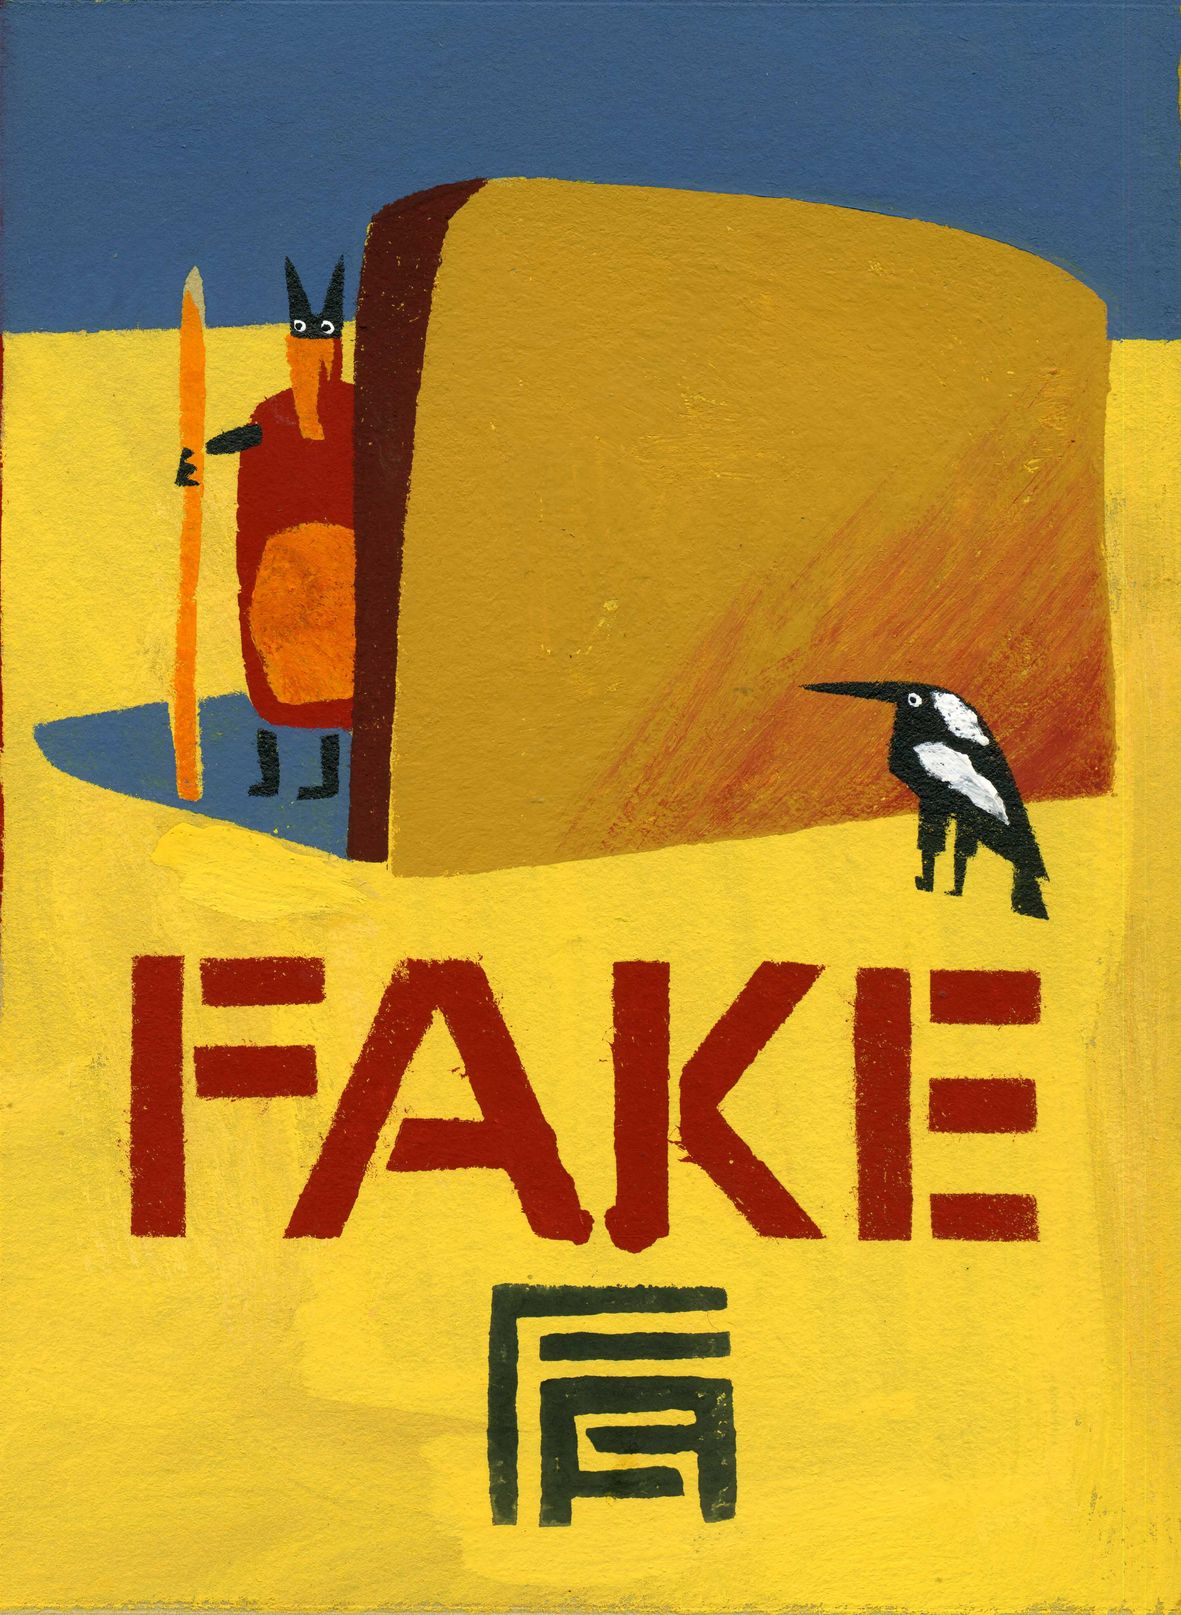 Fake (version 2) , Franki Sparke, stencil and rubber stamp print, 2012